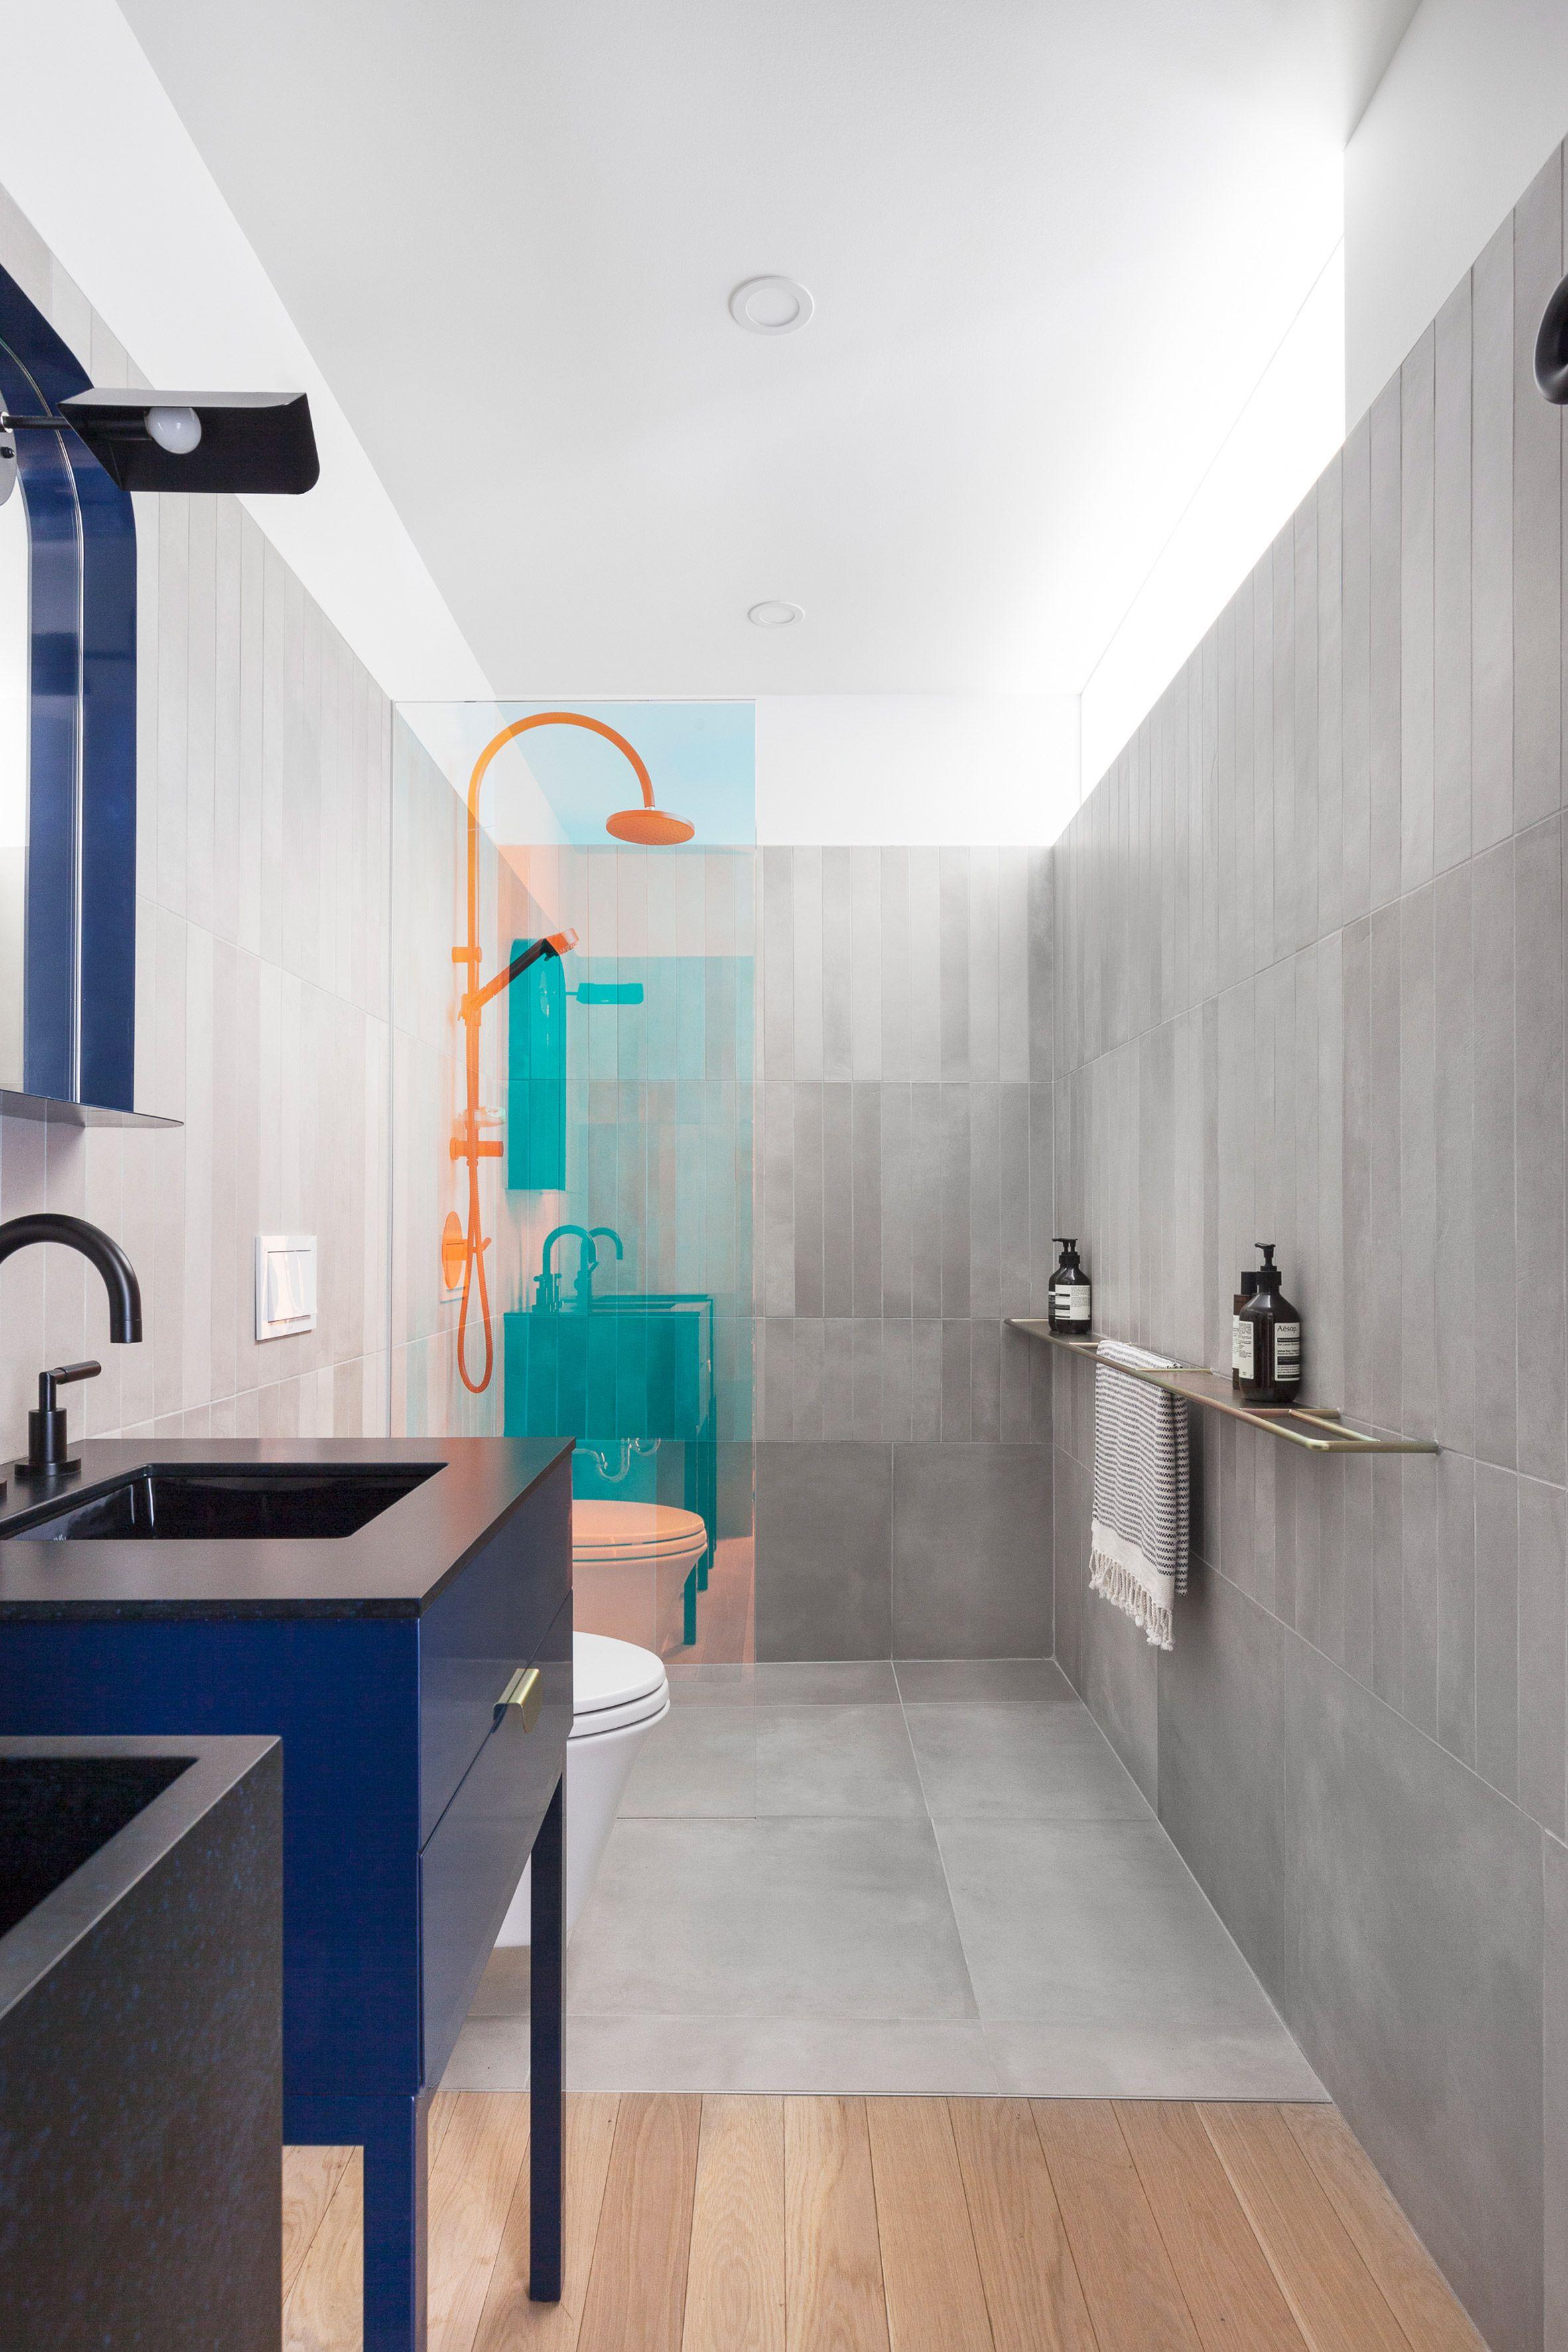 The Bathrooms Feature Vertical Concrete Wall Tiles